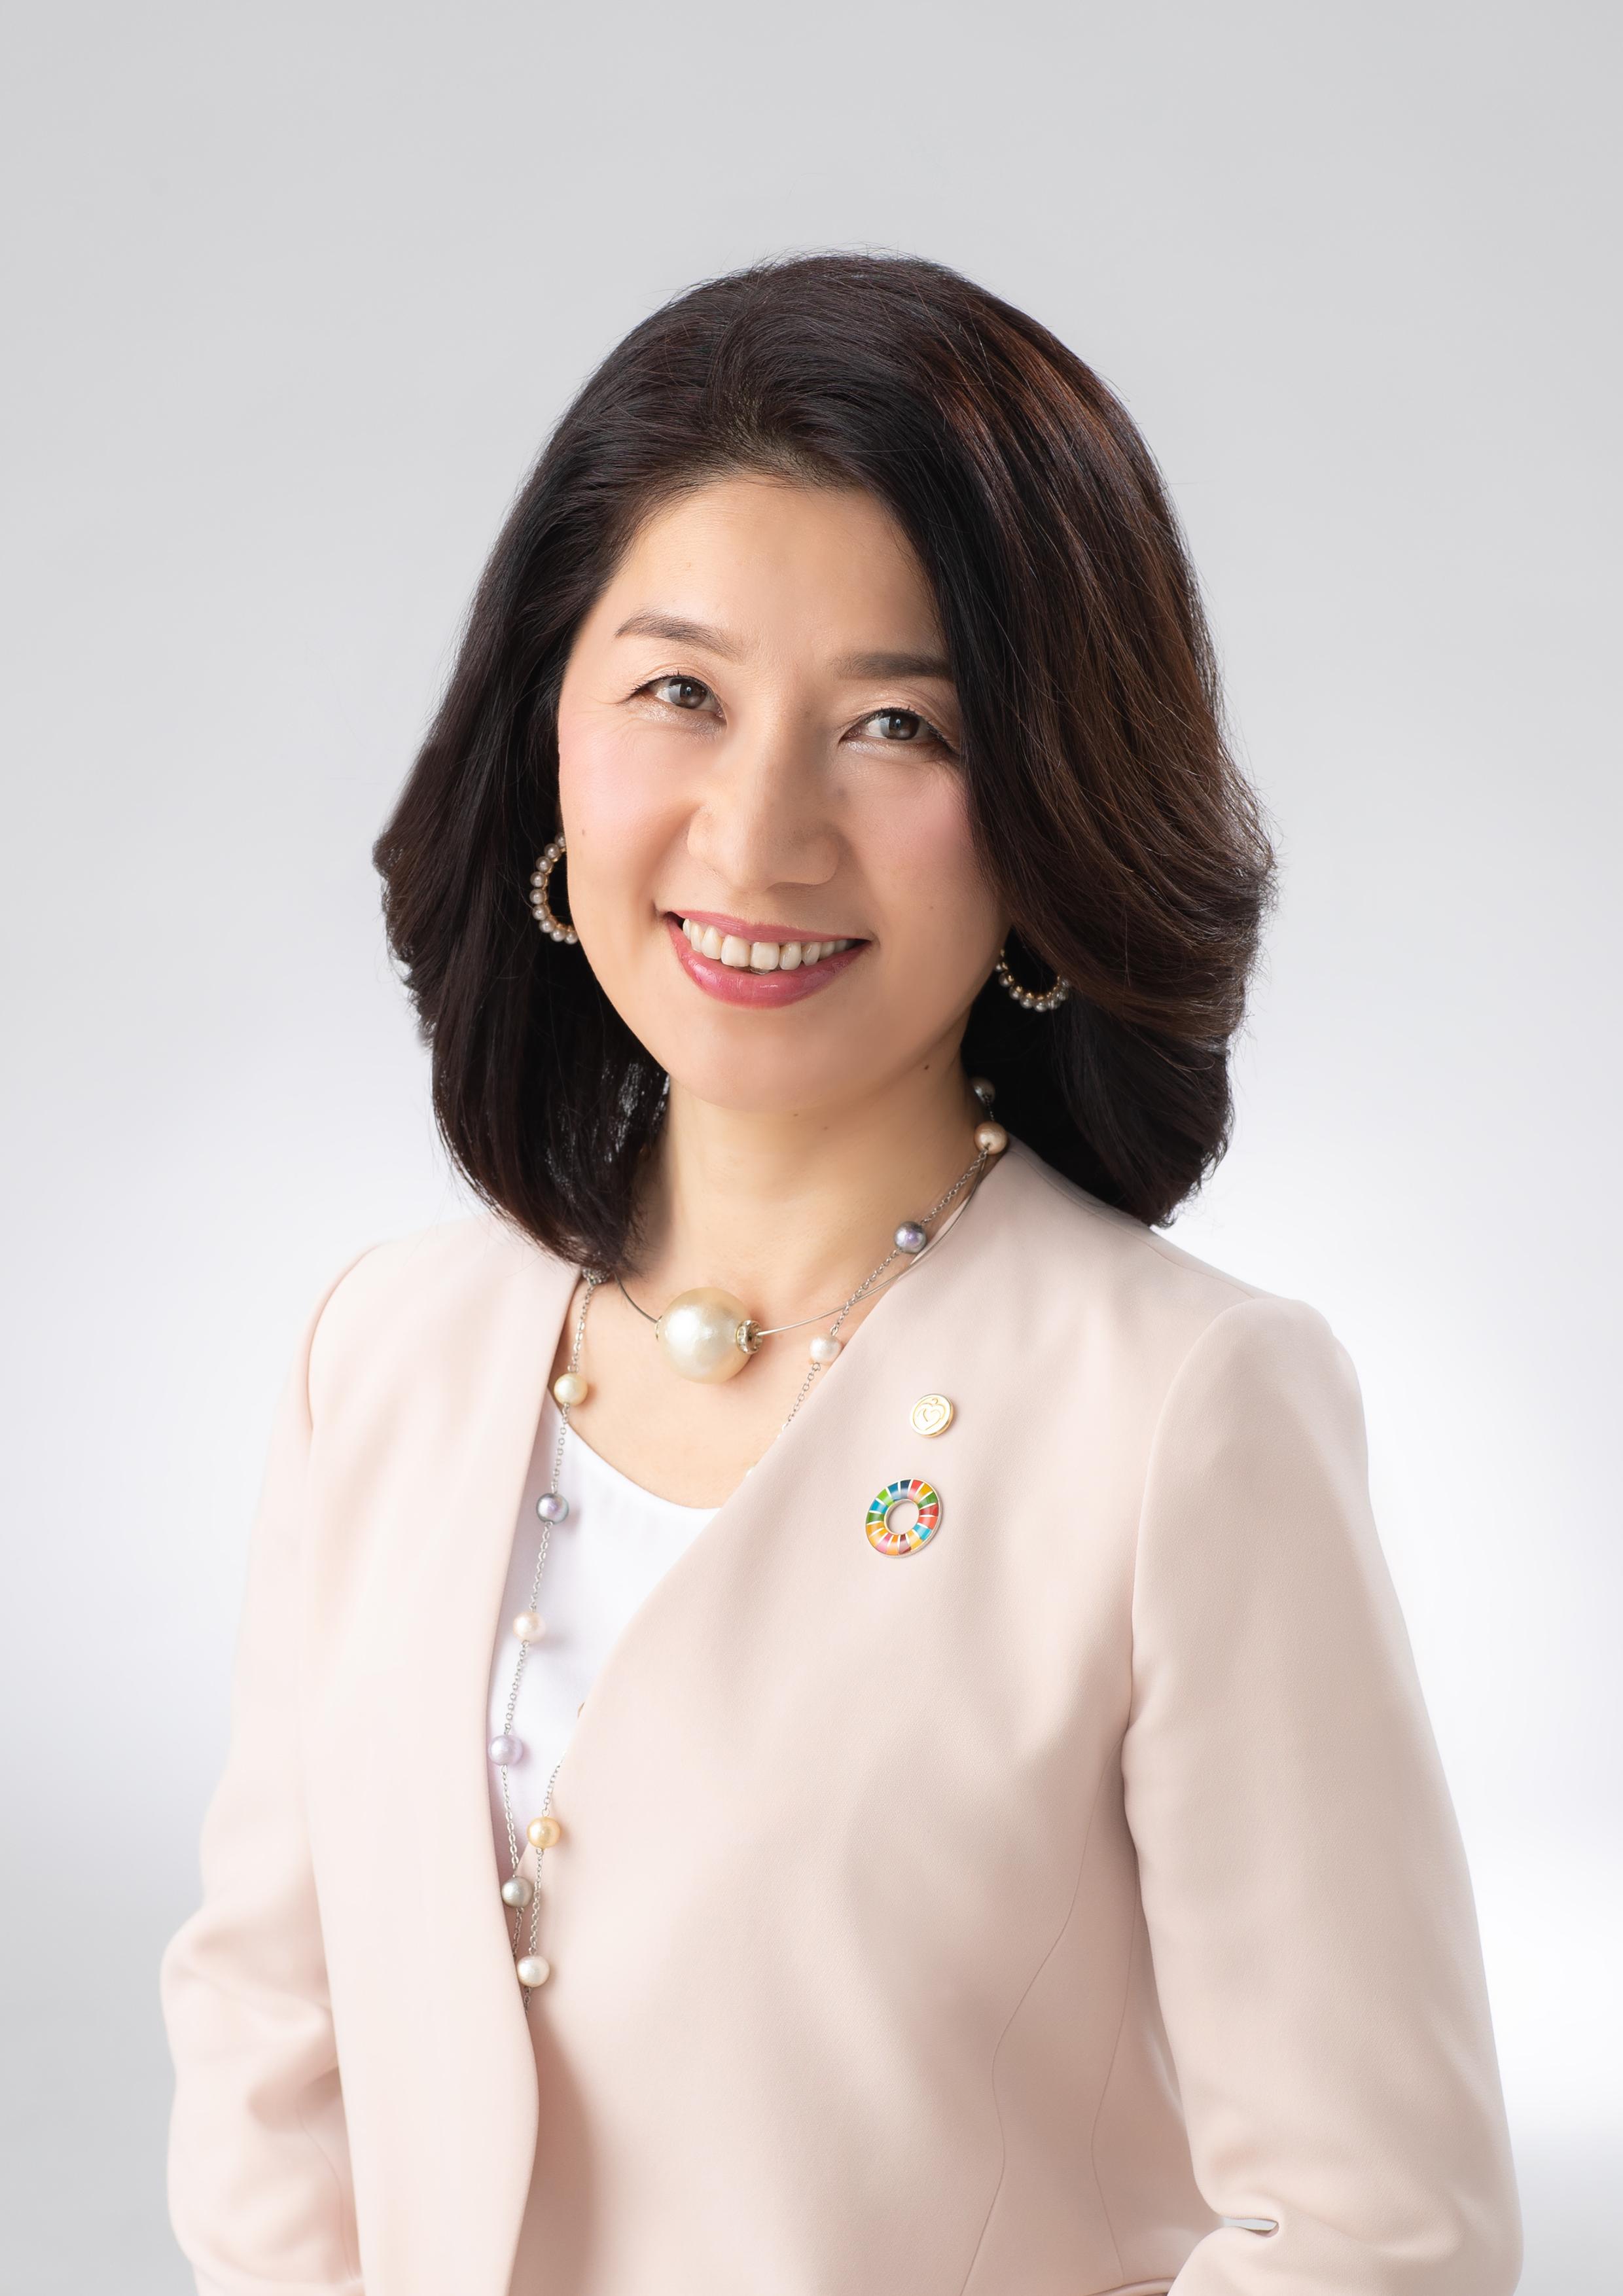 takakomorimoto-profile